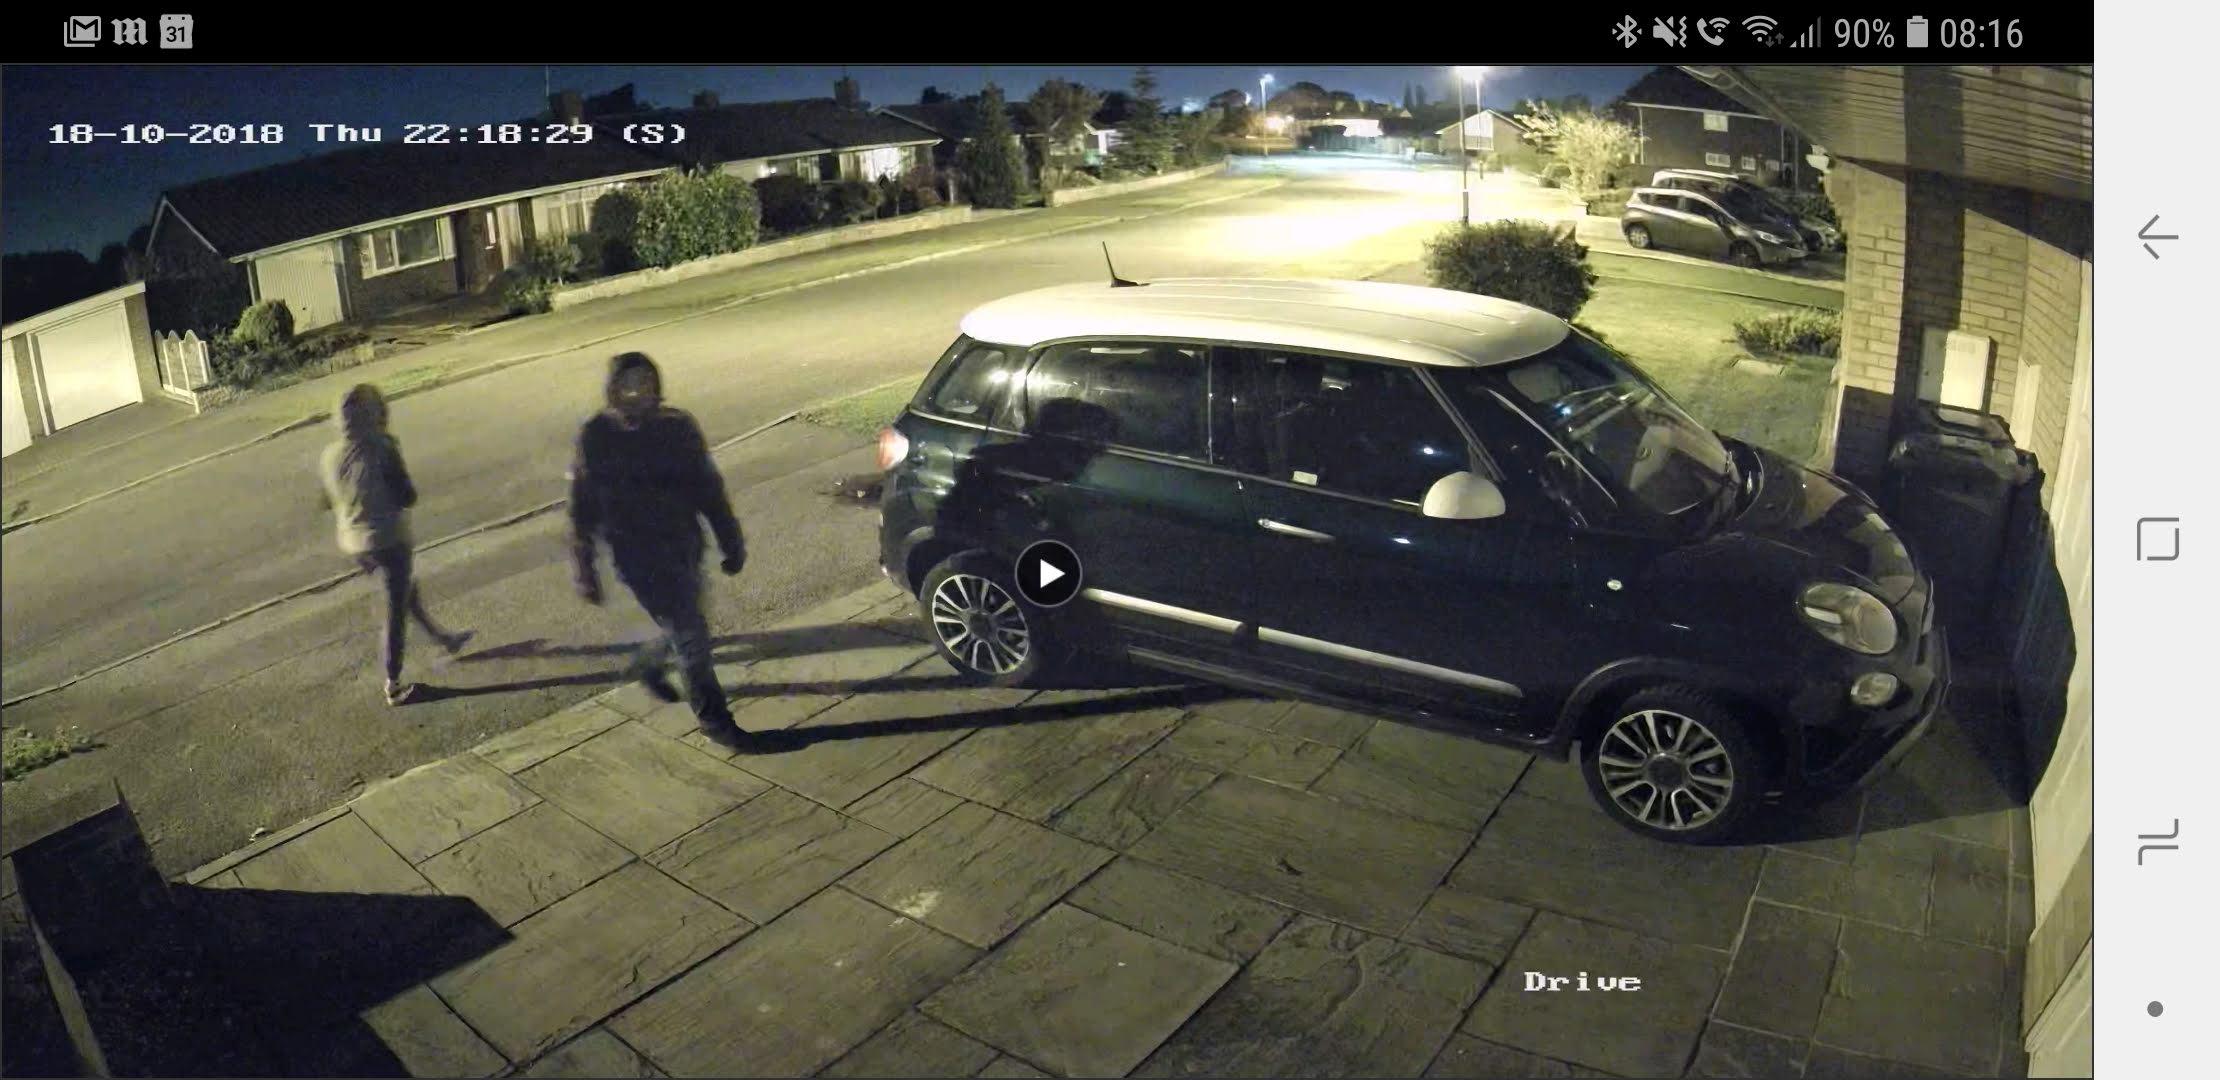 car theft CCTV